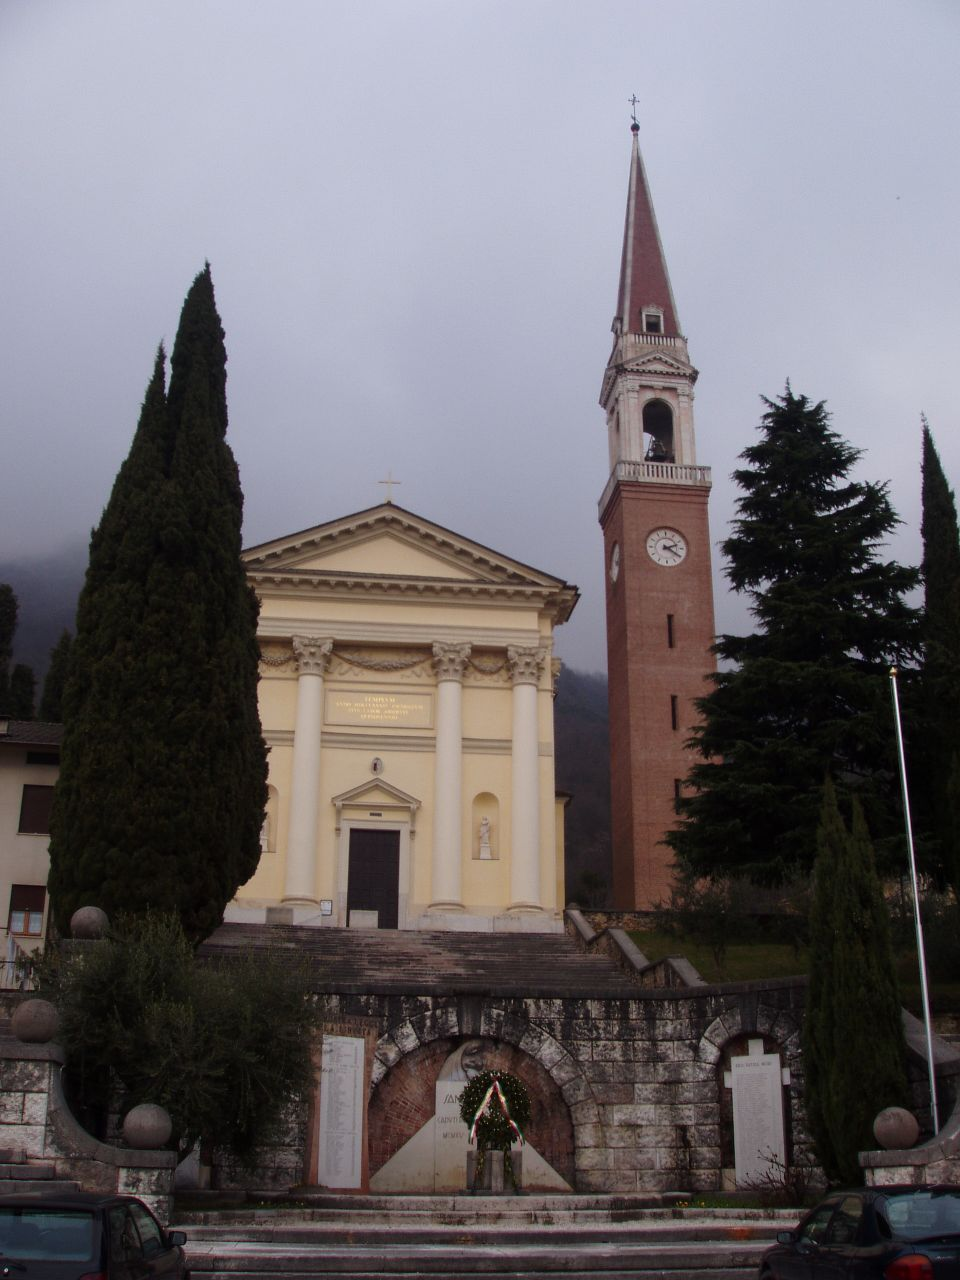 Santorso - Wikipedia